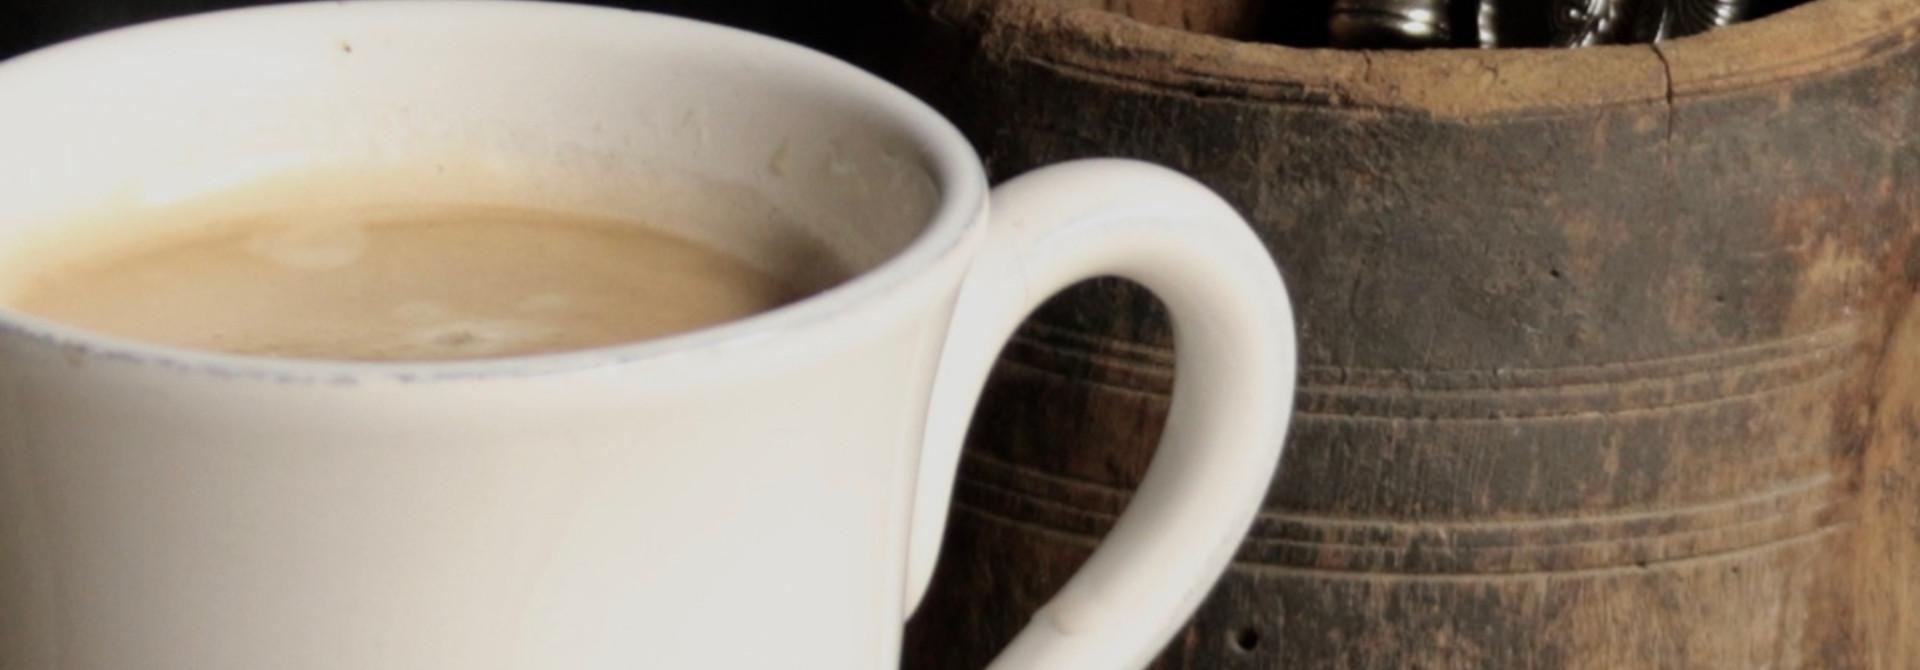 Koffie/Theelepel